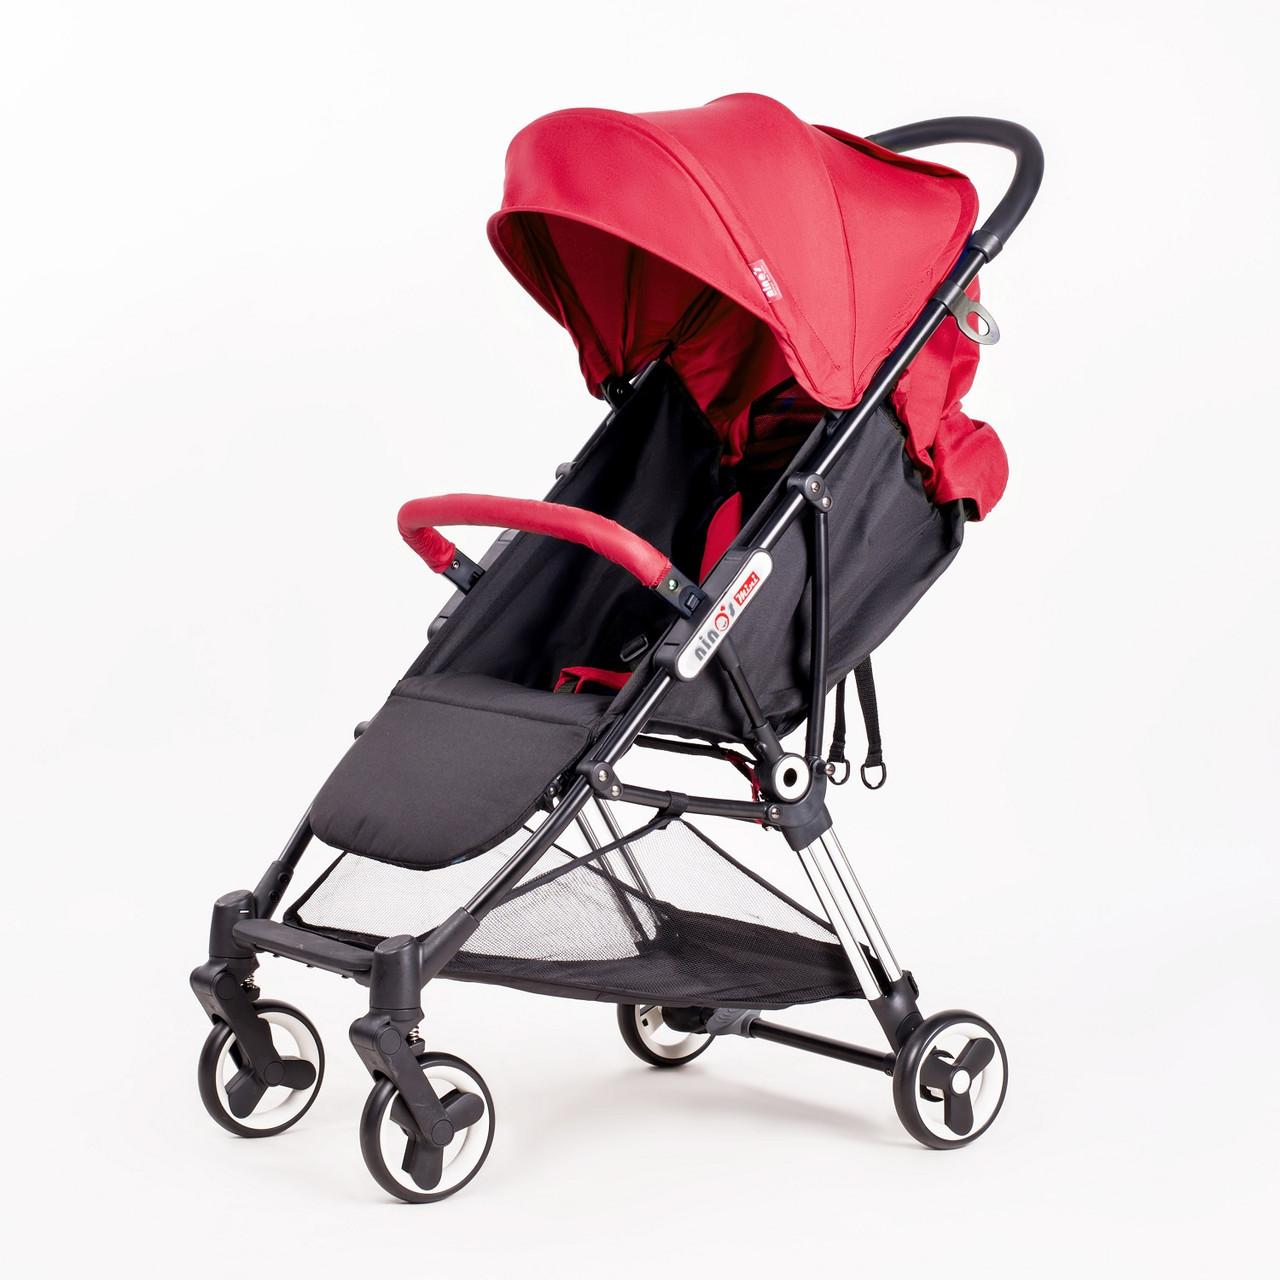 Дитяча прогулянкова коляска Ninos Mini Red 5,8 кг